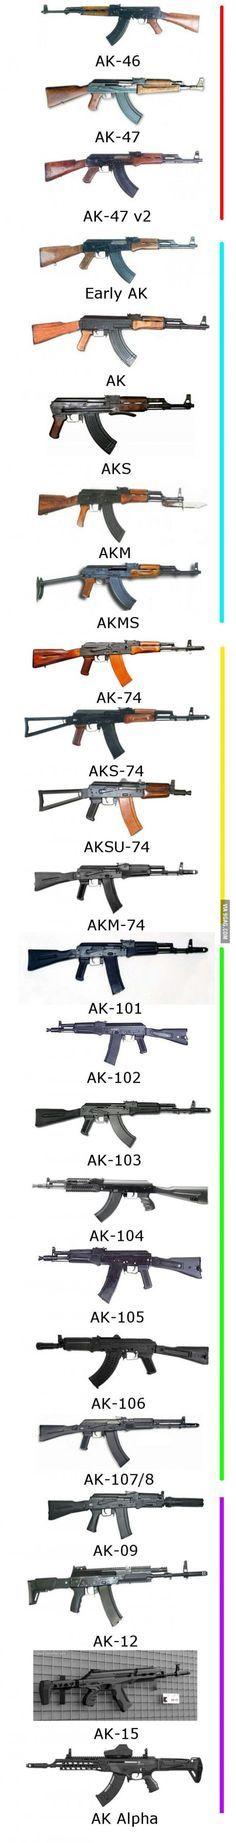 "Not only ""AK-47"" ....my personal favorite the AK 15"